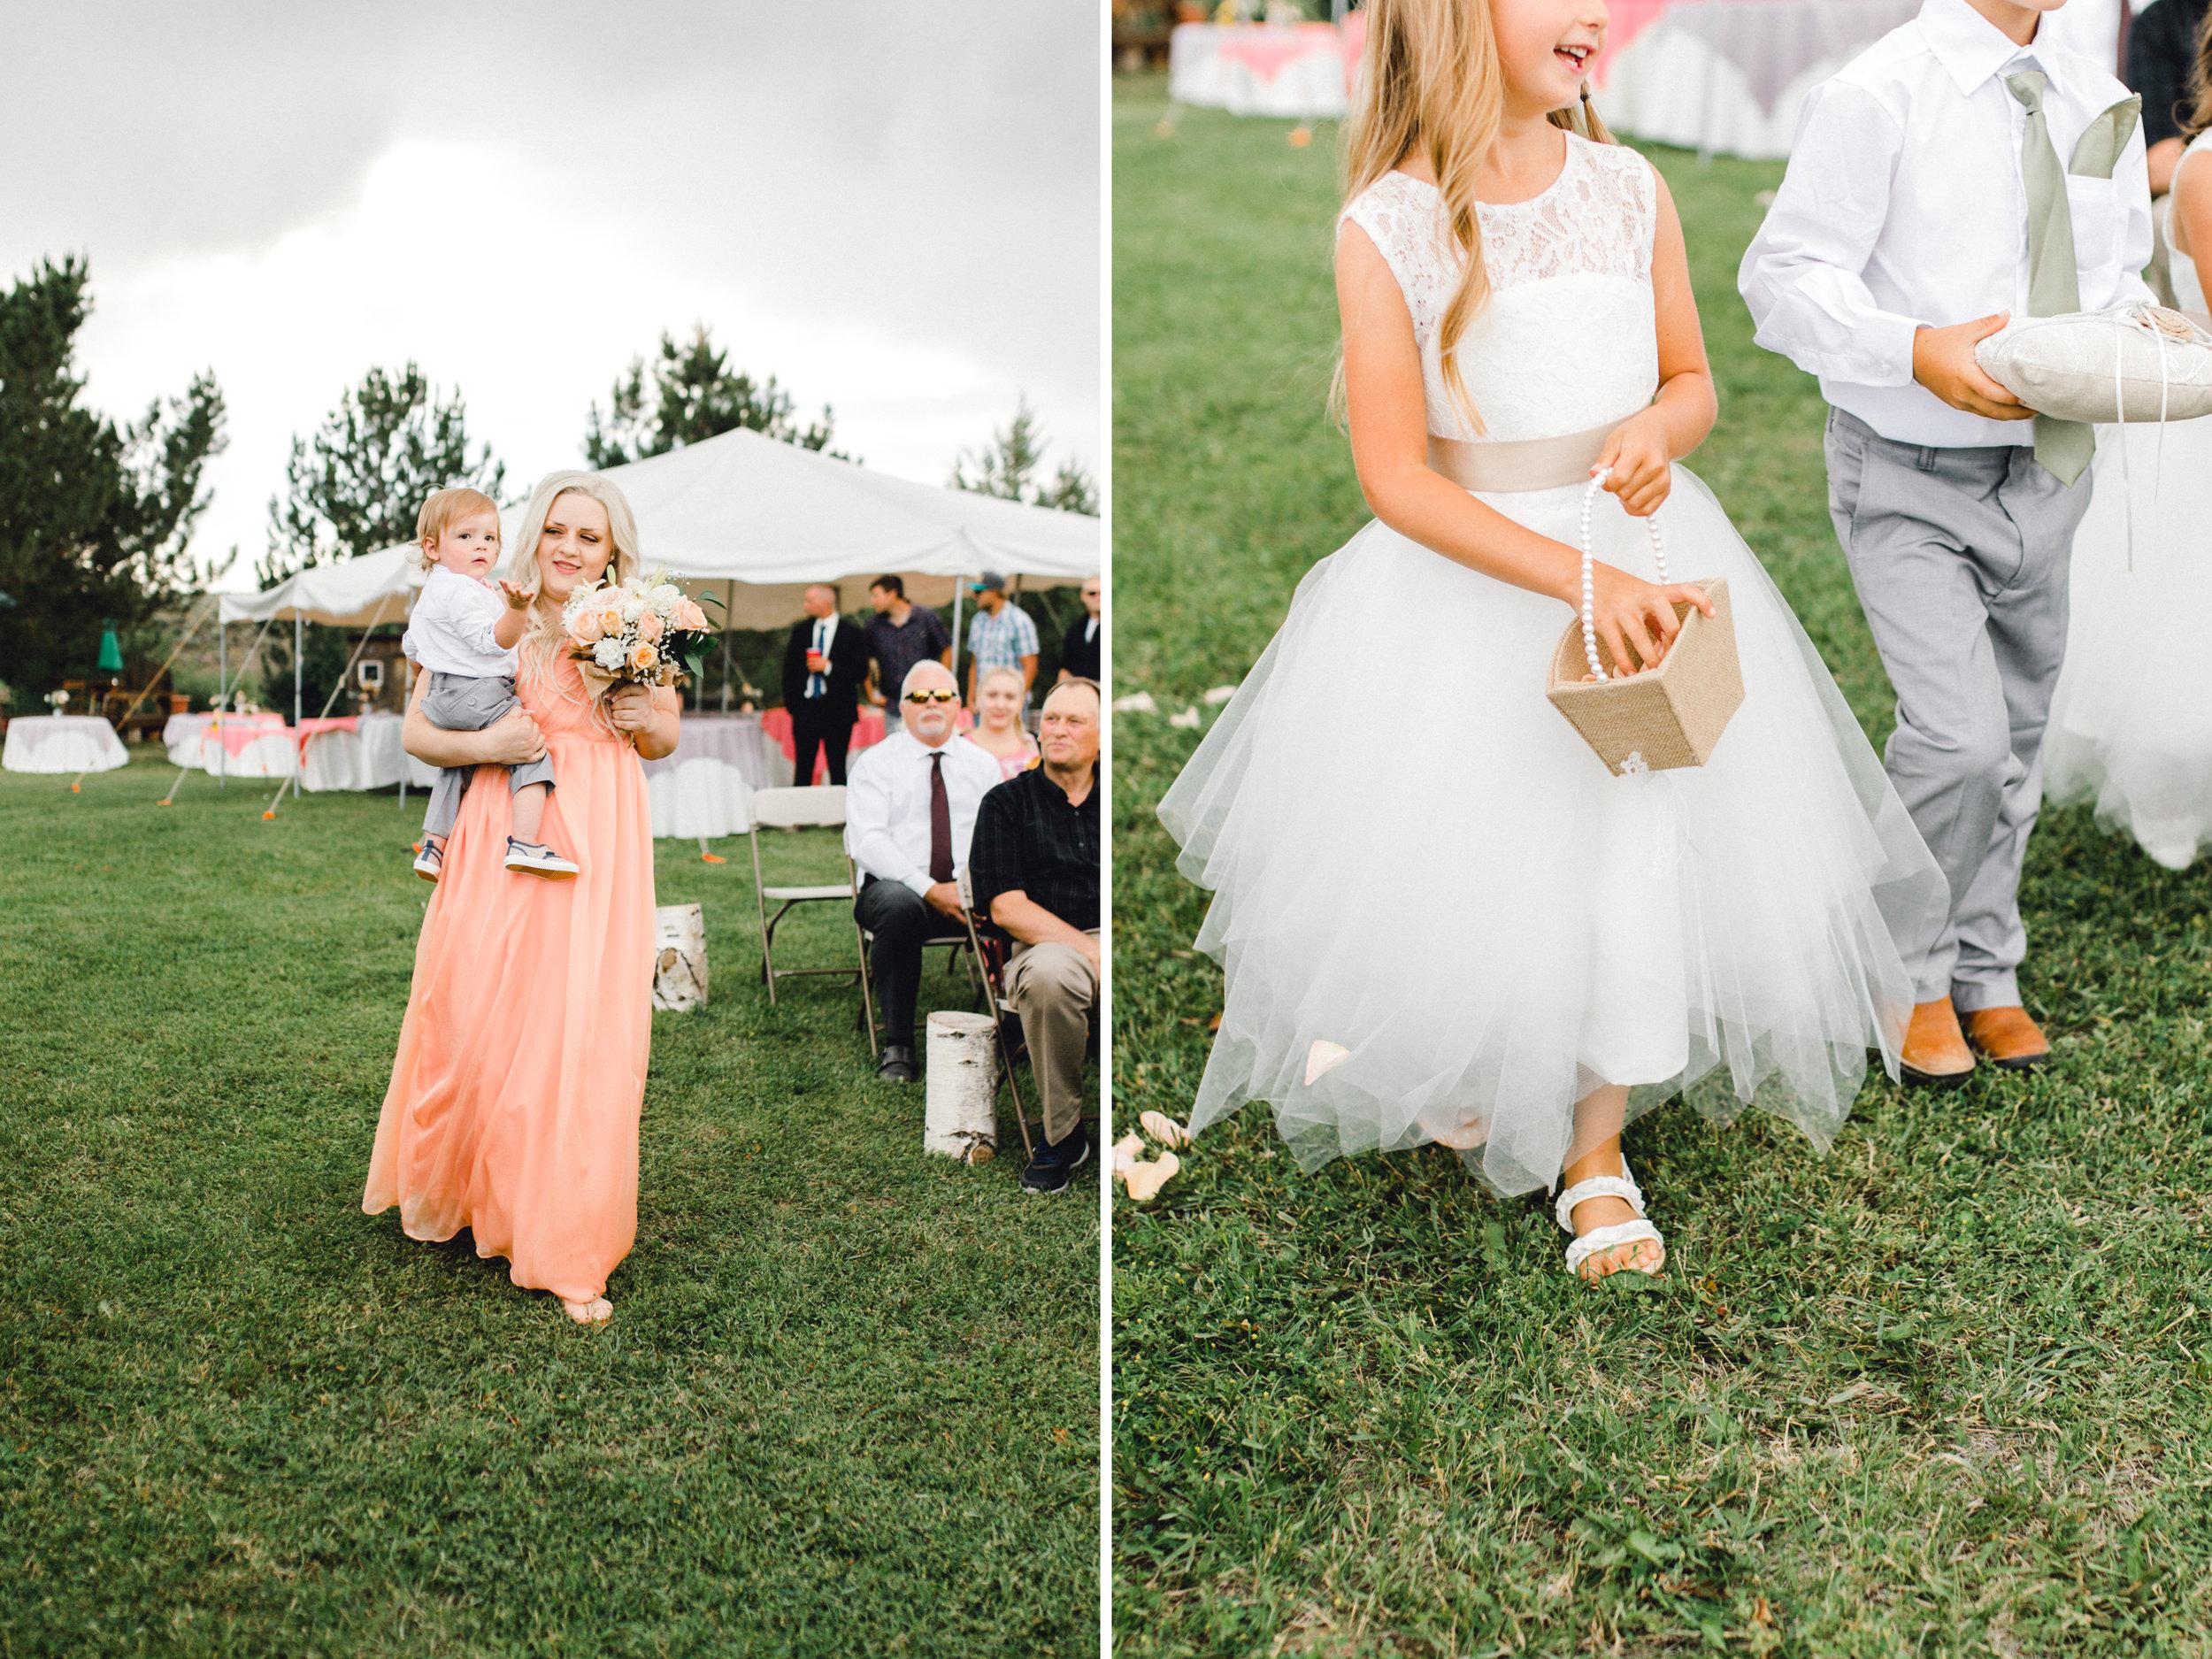 country-outdoor-rustic-wedding-tetons-idaho-anna-christine-photo-16.jpg